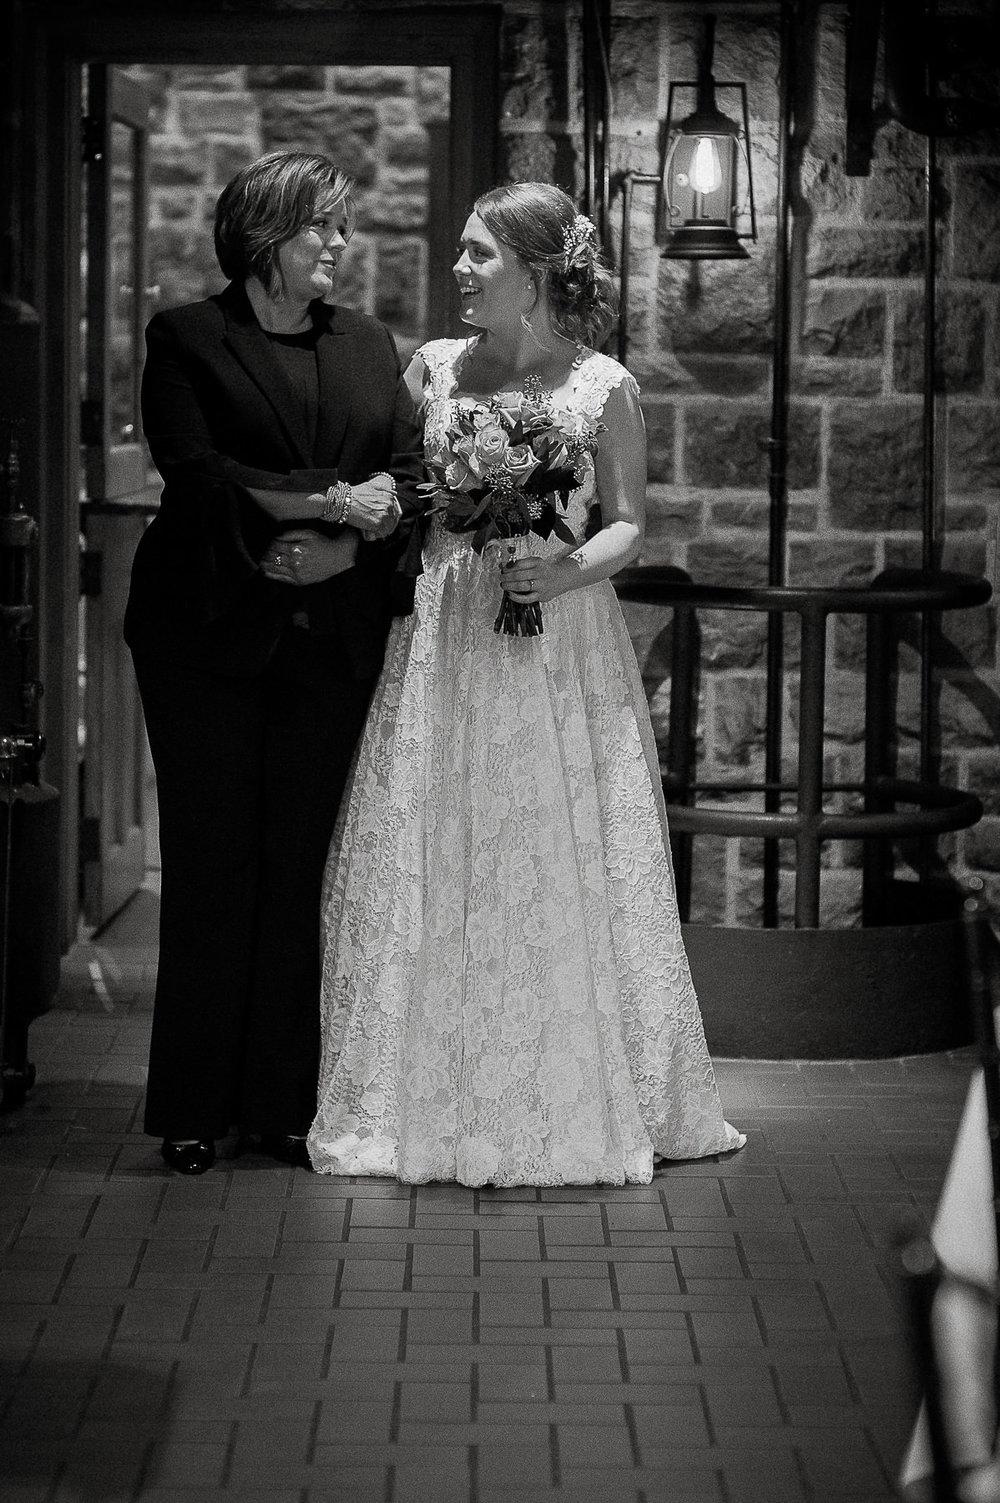 breighton-and-basette-photography-copyrighted-image-blog-amanda-and-eric-wedding-073.jpg